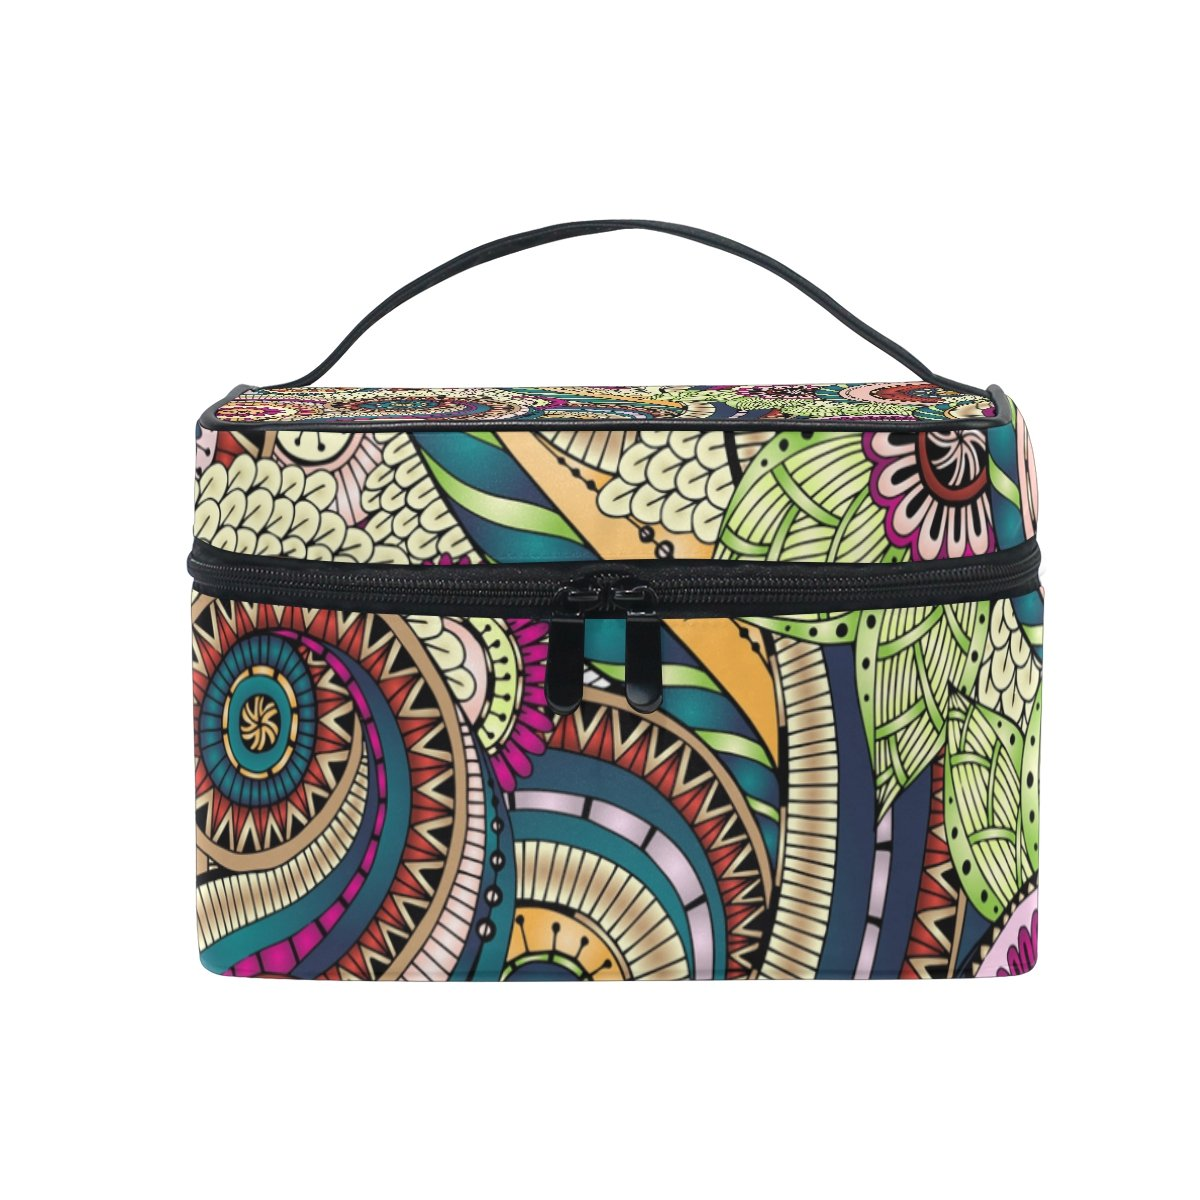 SAVSV Seamless Flower Retro Background Cosmetic Bag Toiletry Bags Travel Makeup Large Organizer Portable Multifunction Case for Women Girls